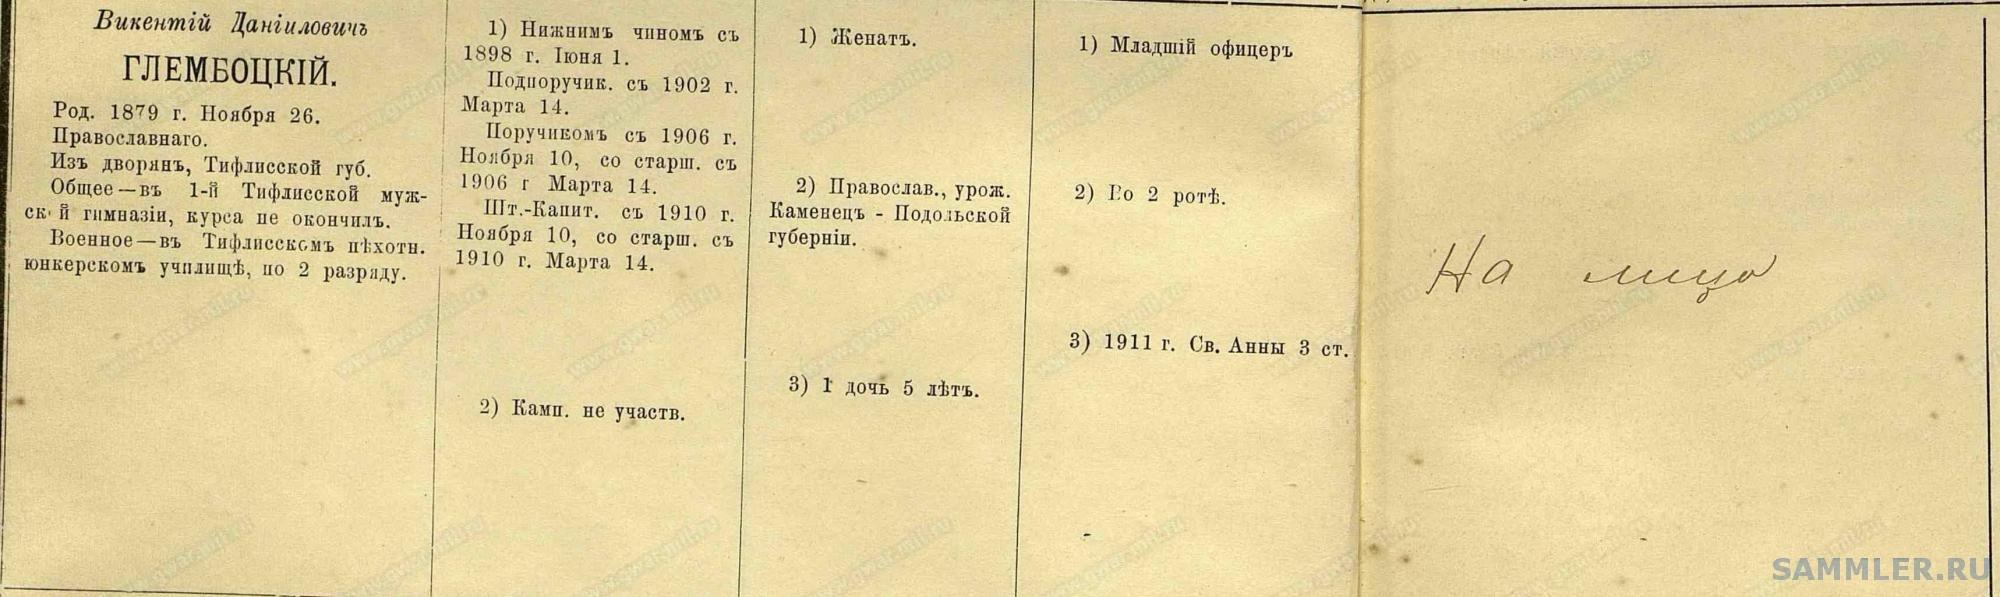 Глембоцкий В.Д. 1.jpg